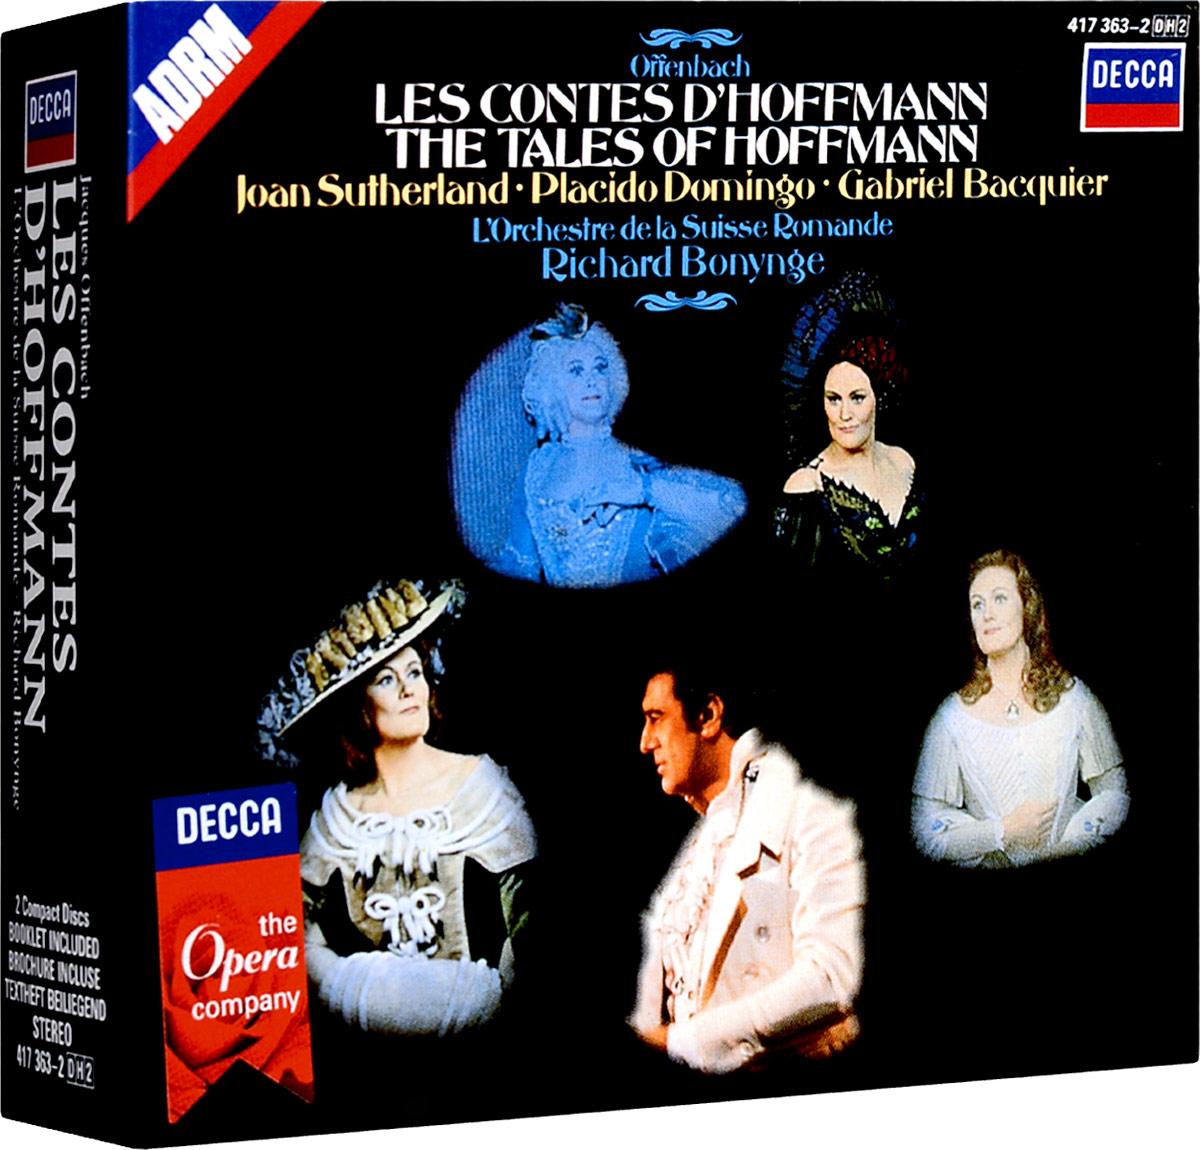 цена на Ричард Бонинг Richard Bonynge. Offenbach: Les Contes D'Hoffman (2 CD)